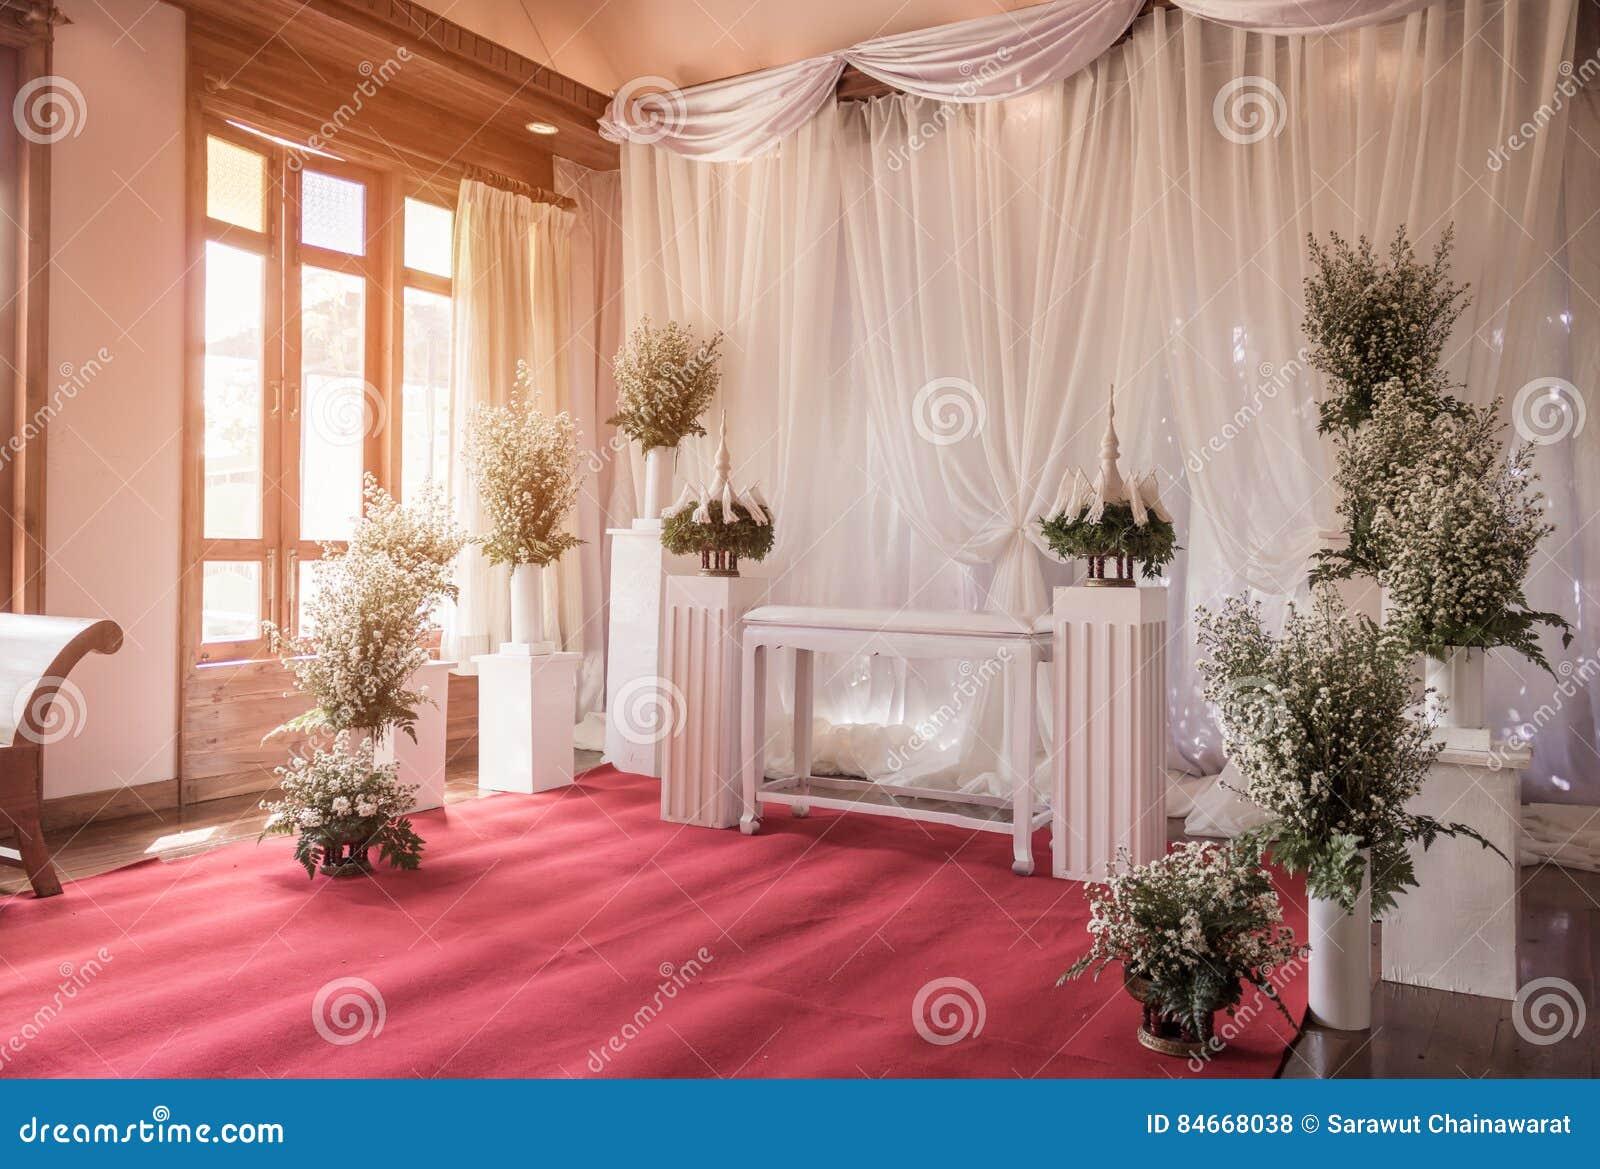 Wedding Interior Decoration Images Of Interior Ceremony Wedding Room Decoration By Red Carpet